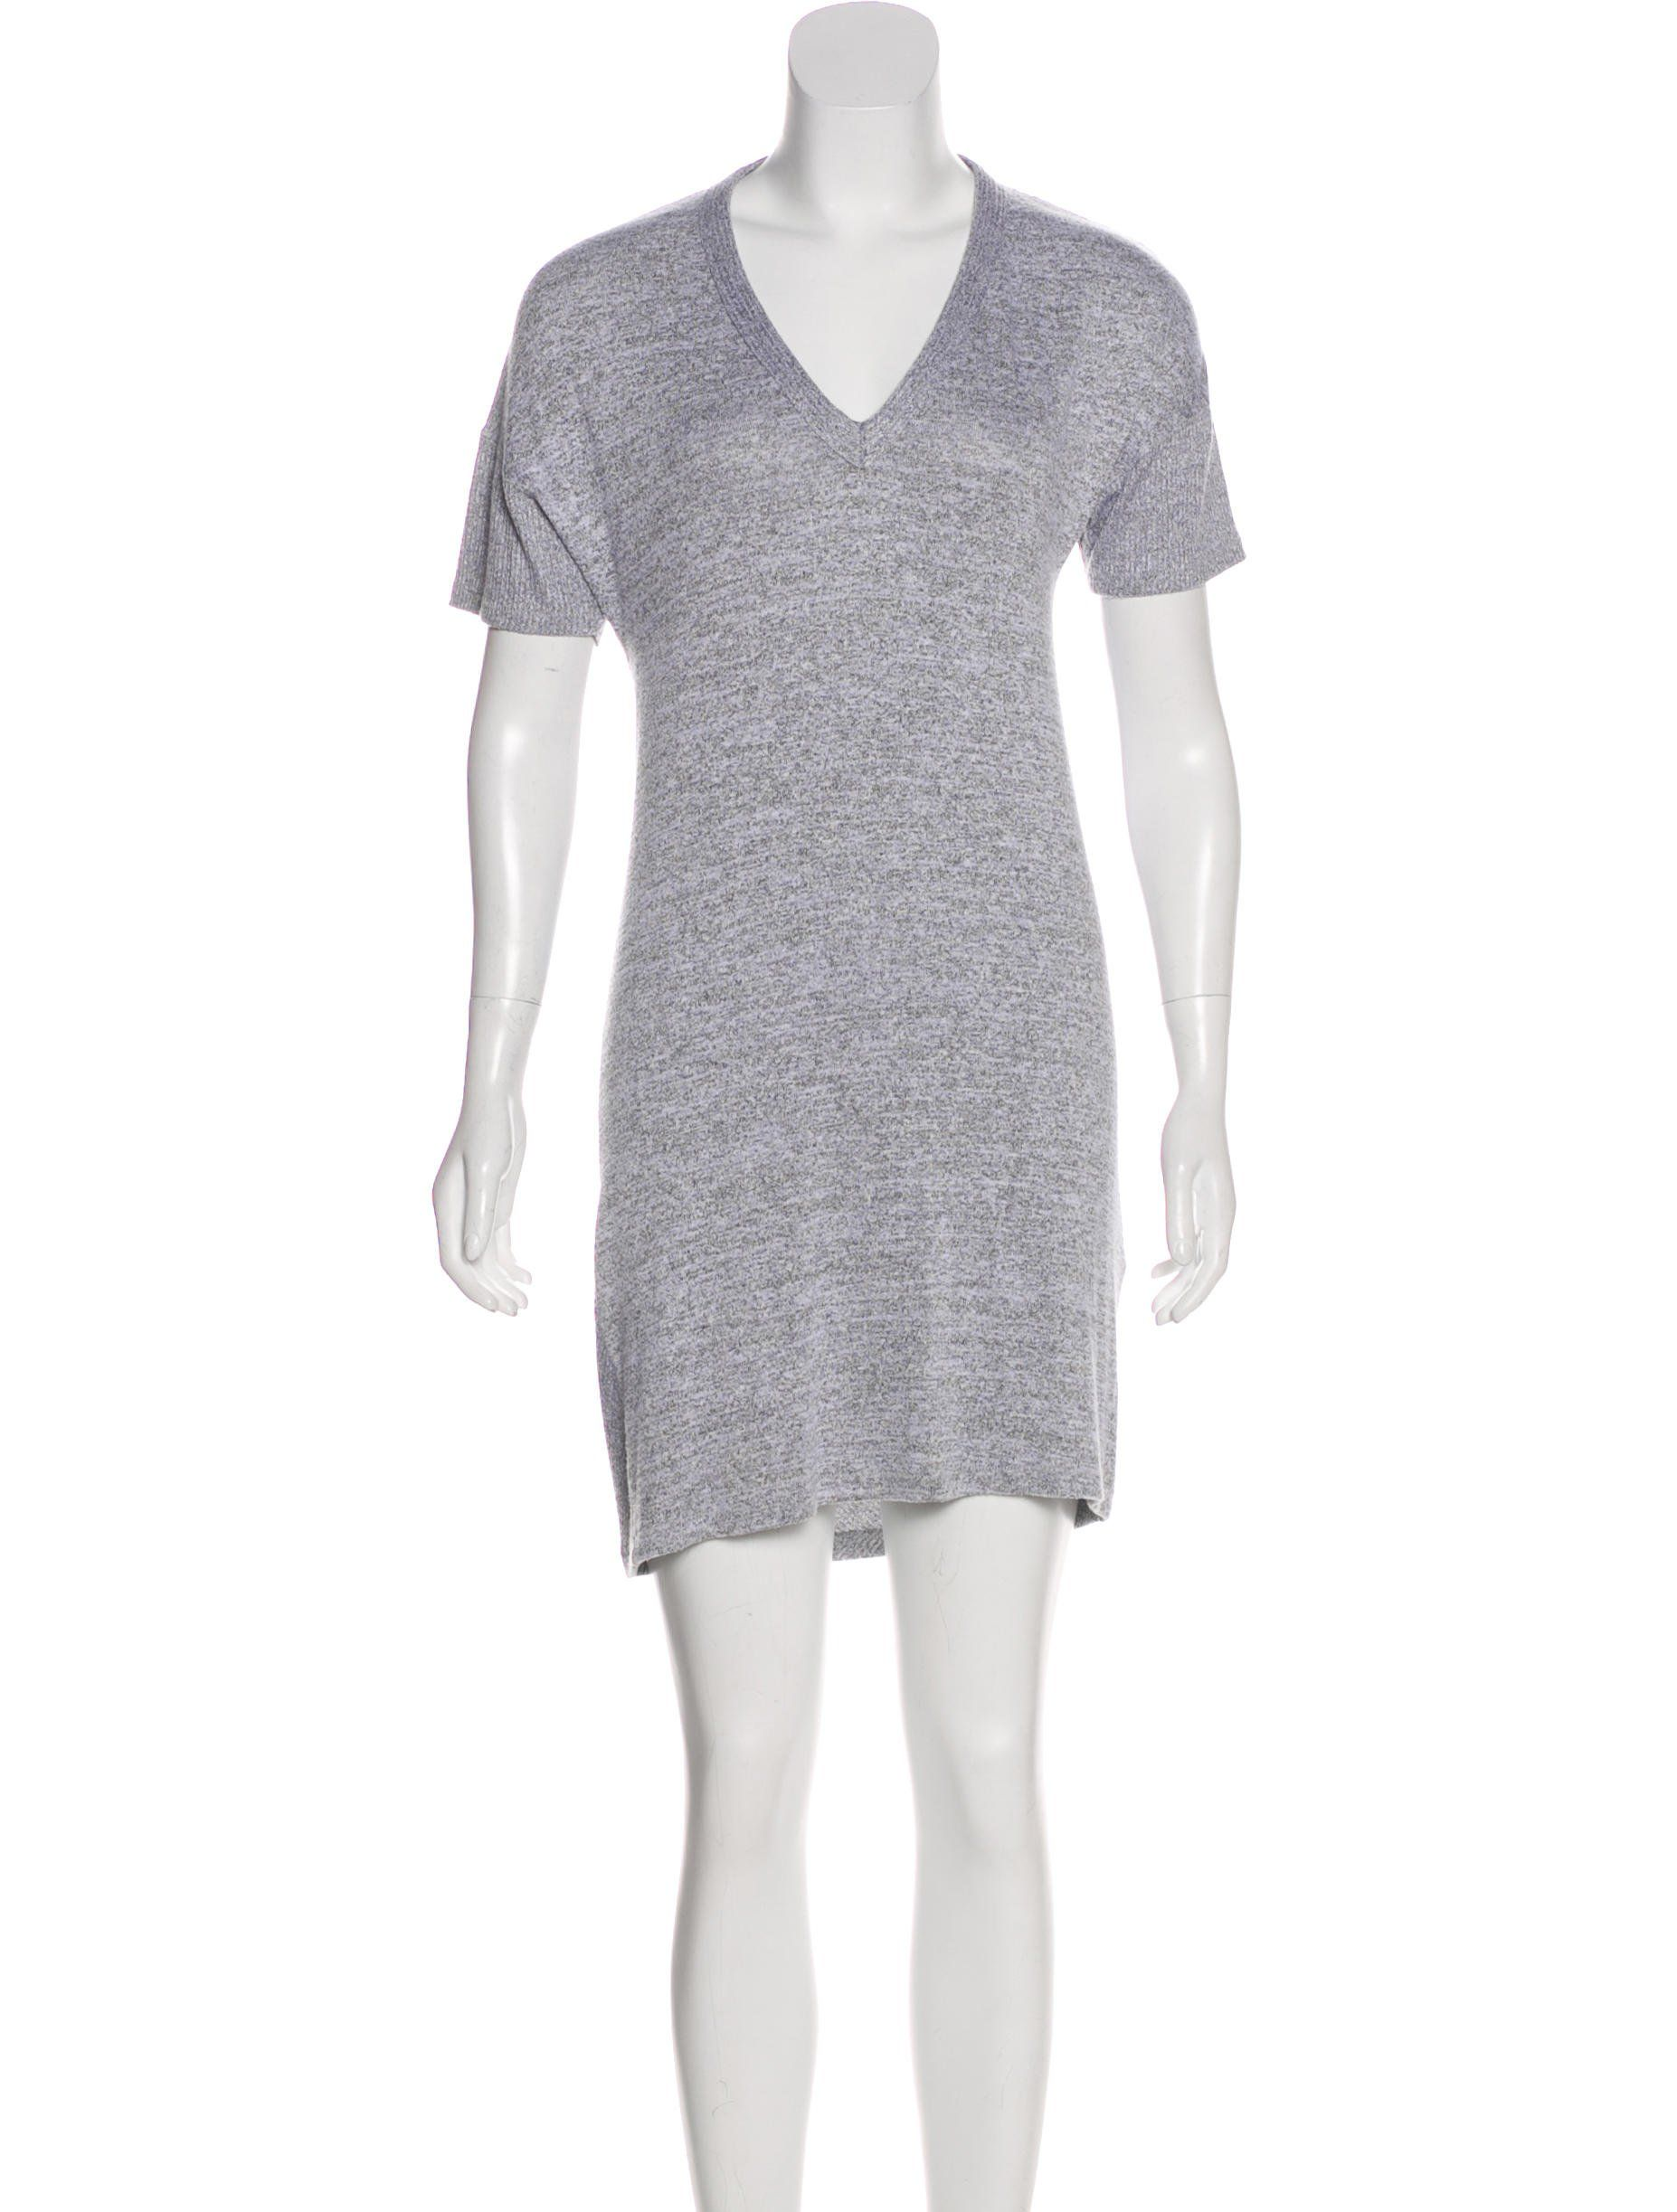 Heather Grey Rag Bone Mini Sweater Dress With V Neck Short Sleeves And Rib Knit Trim Sweater Dress Mini Sweater Dress Dresses [ 2446 x 1854 Pixel ]